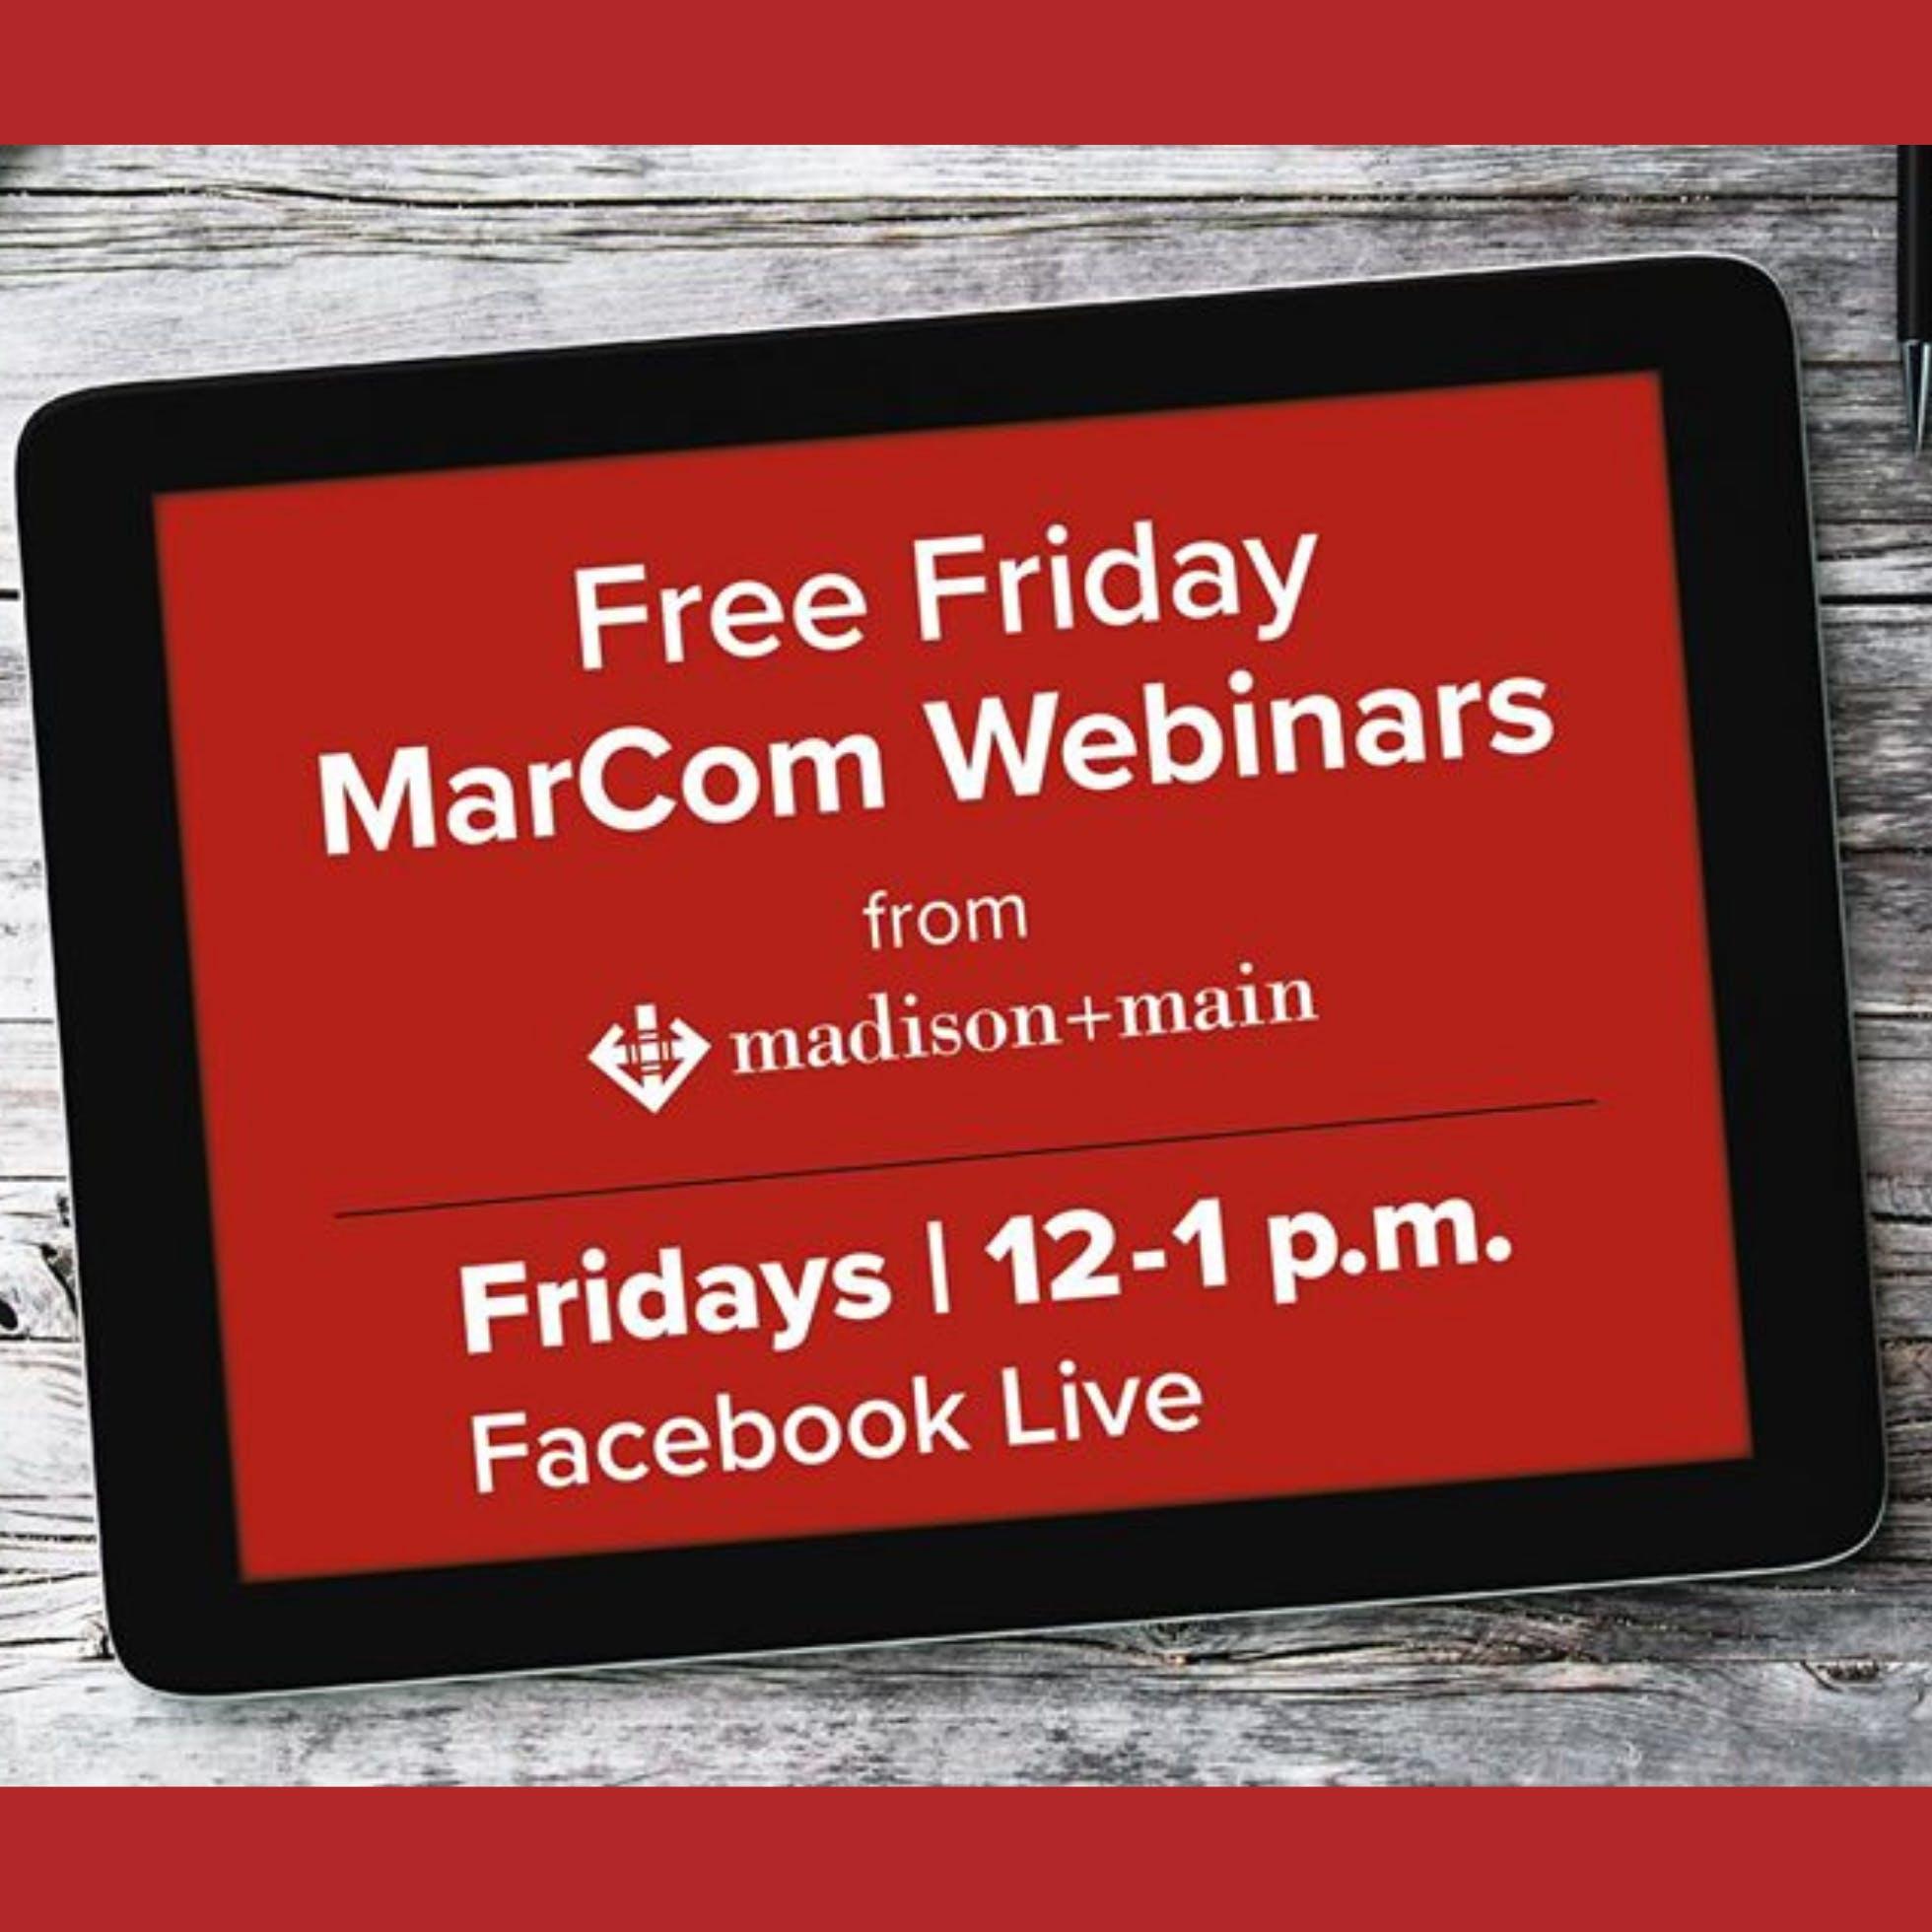 Free Friday MarCom Webinars